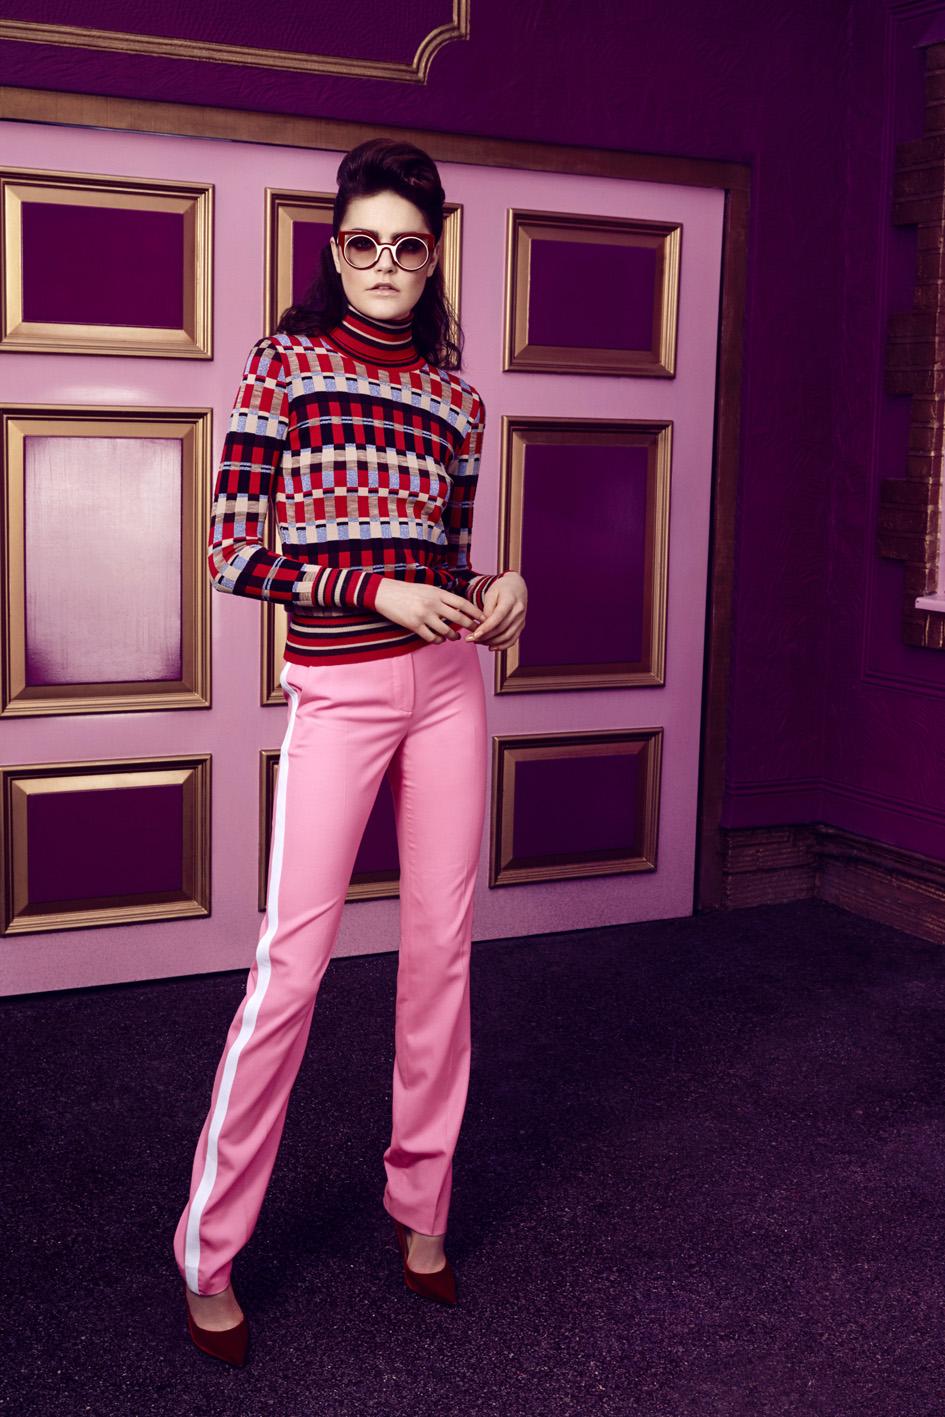 julia_kennedy_daphne_velghe_pink_house_07.jpg